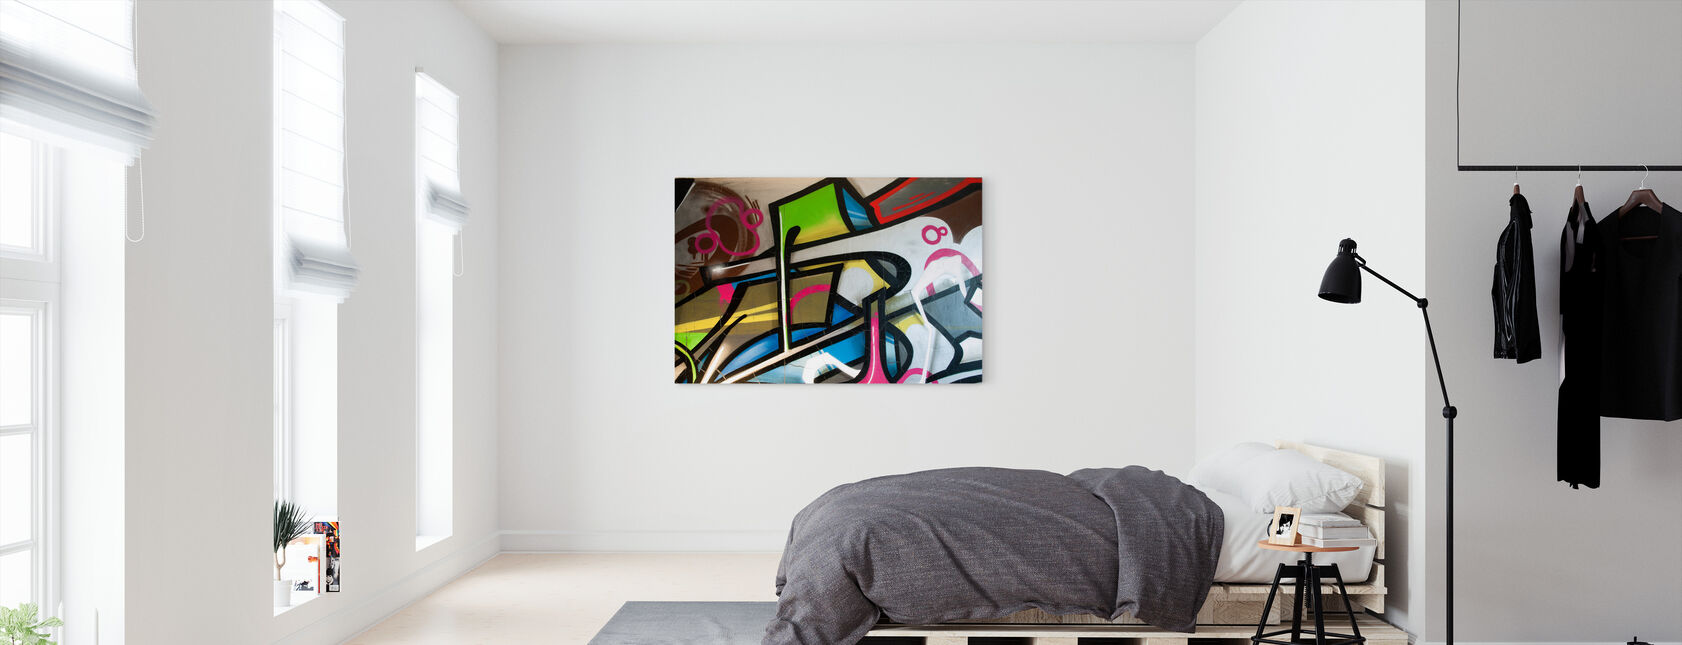 Colorful Graffiti - Canvas print - Bedroom